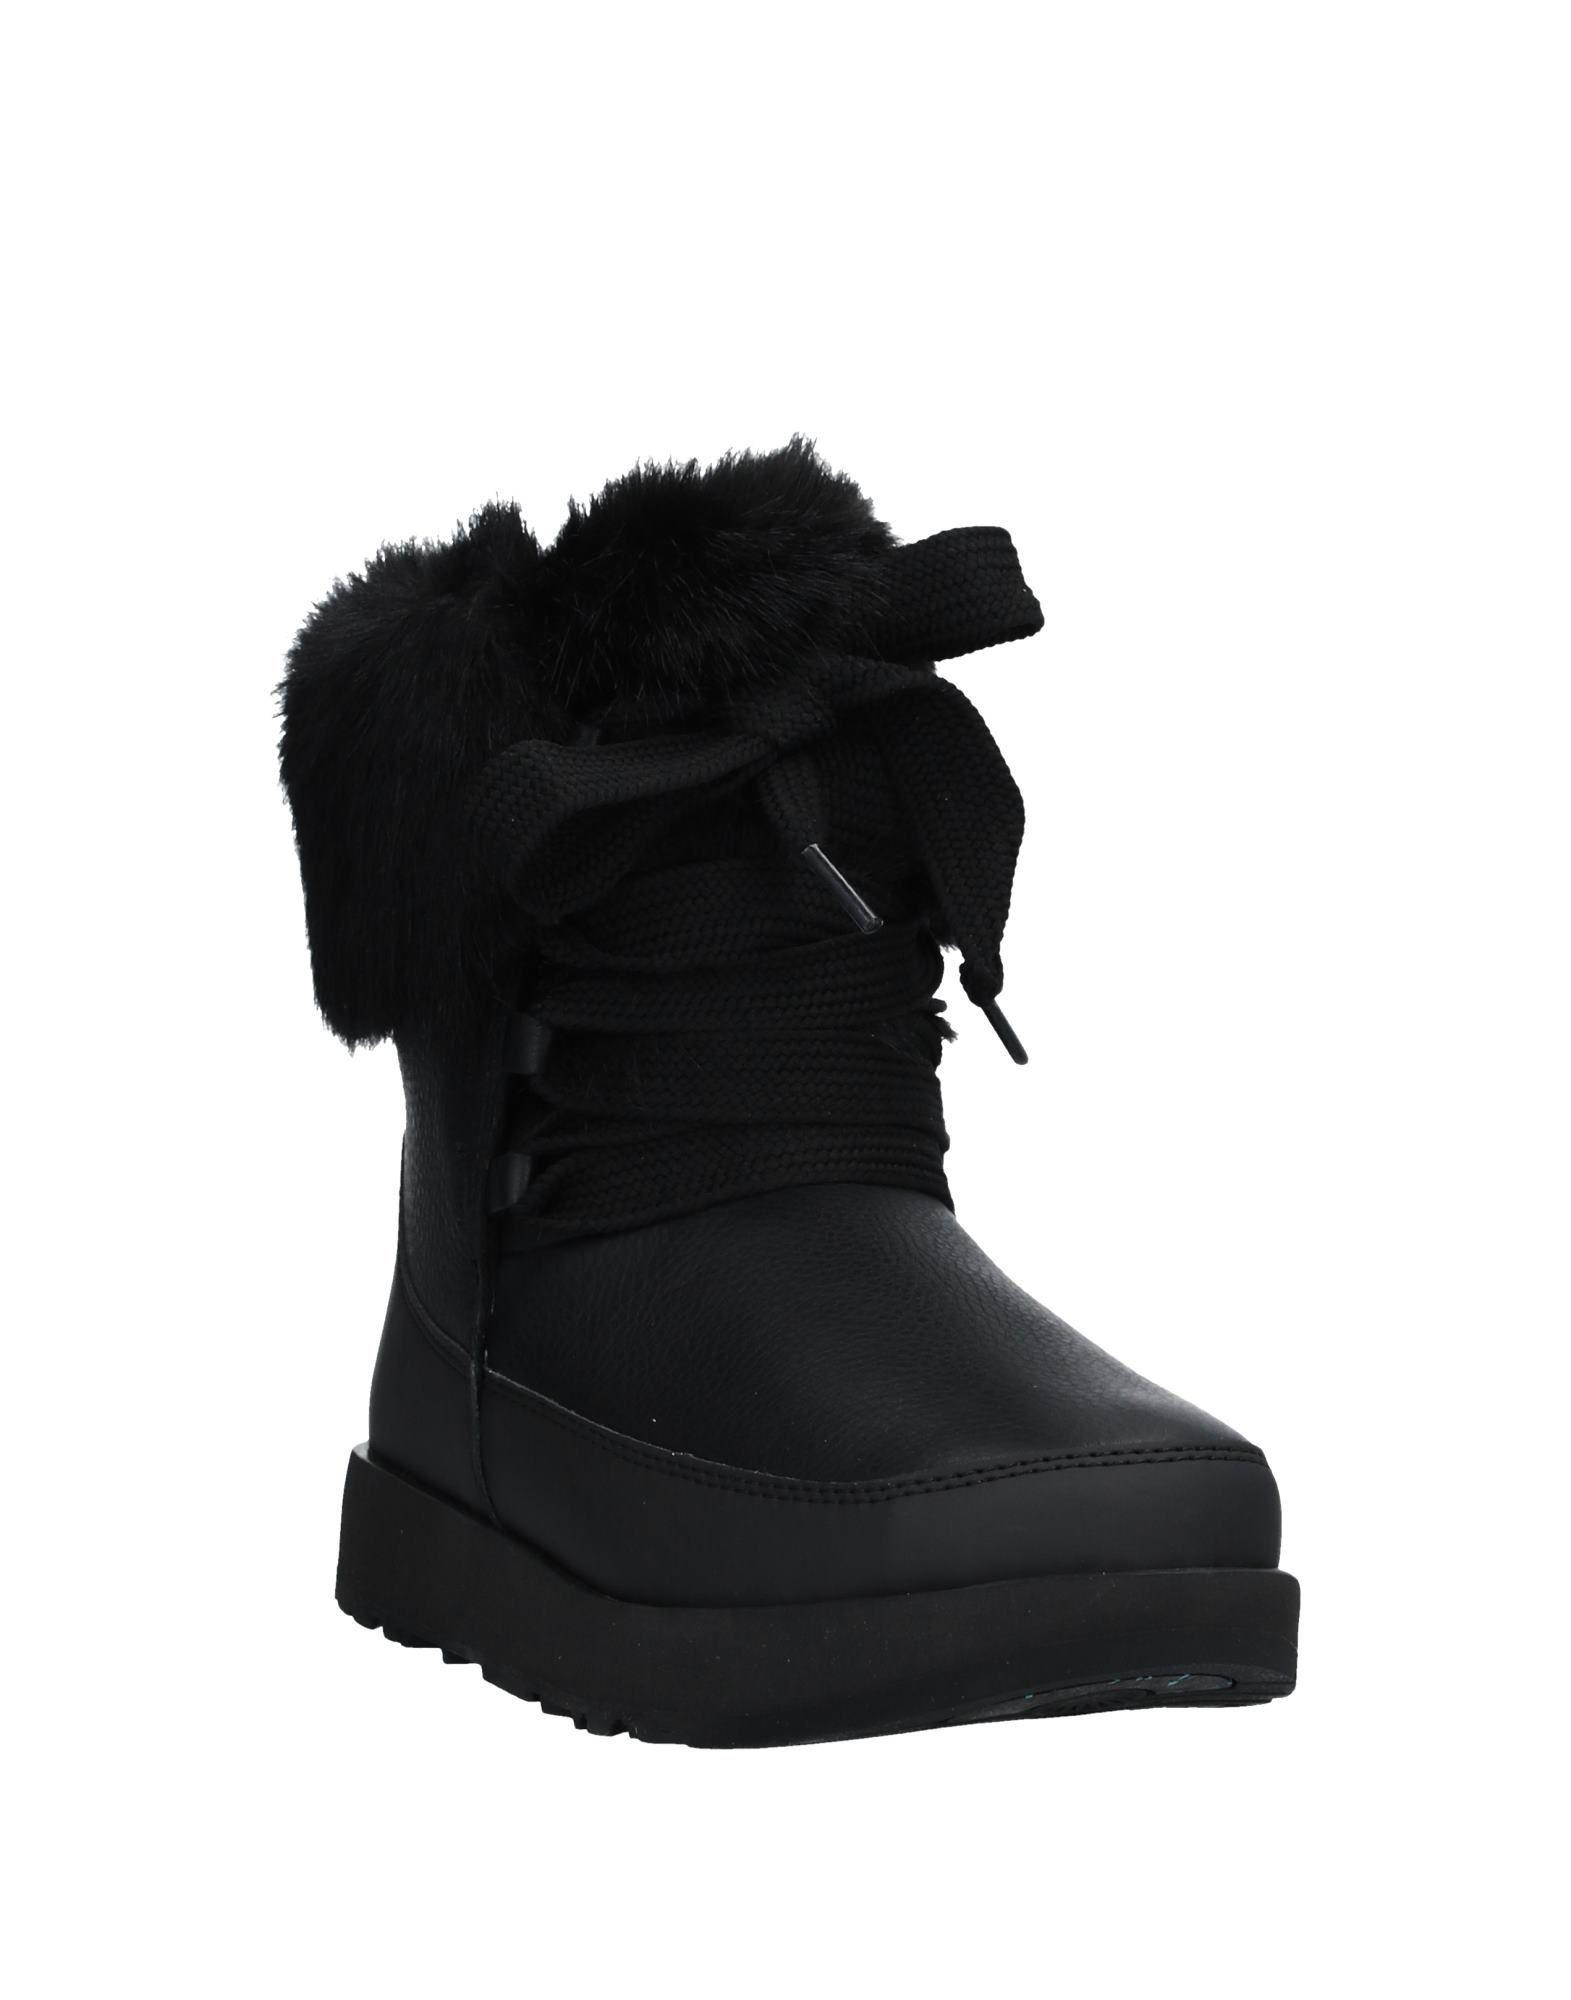 Ugg Australia Black Leather Lace Up Boots